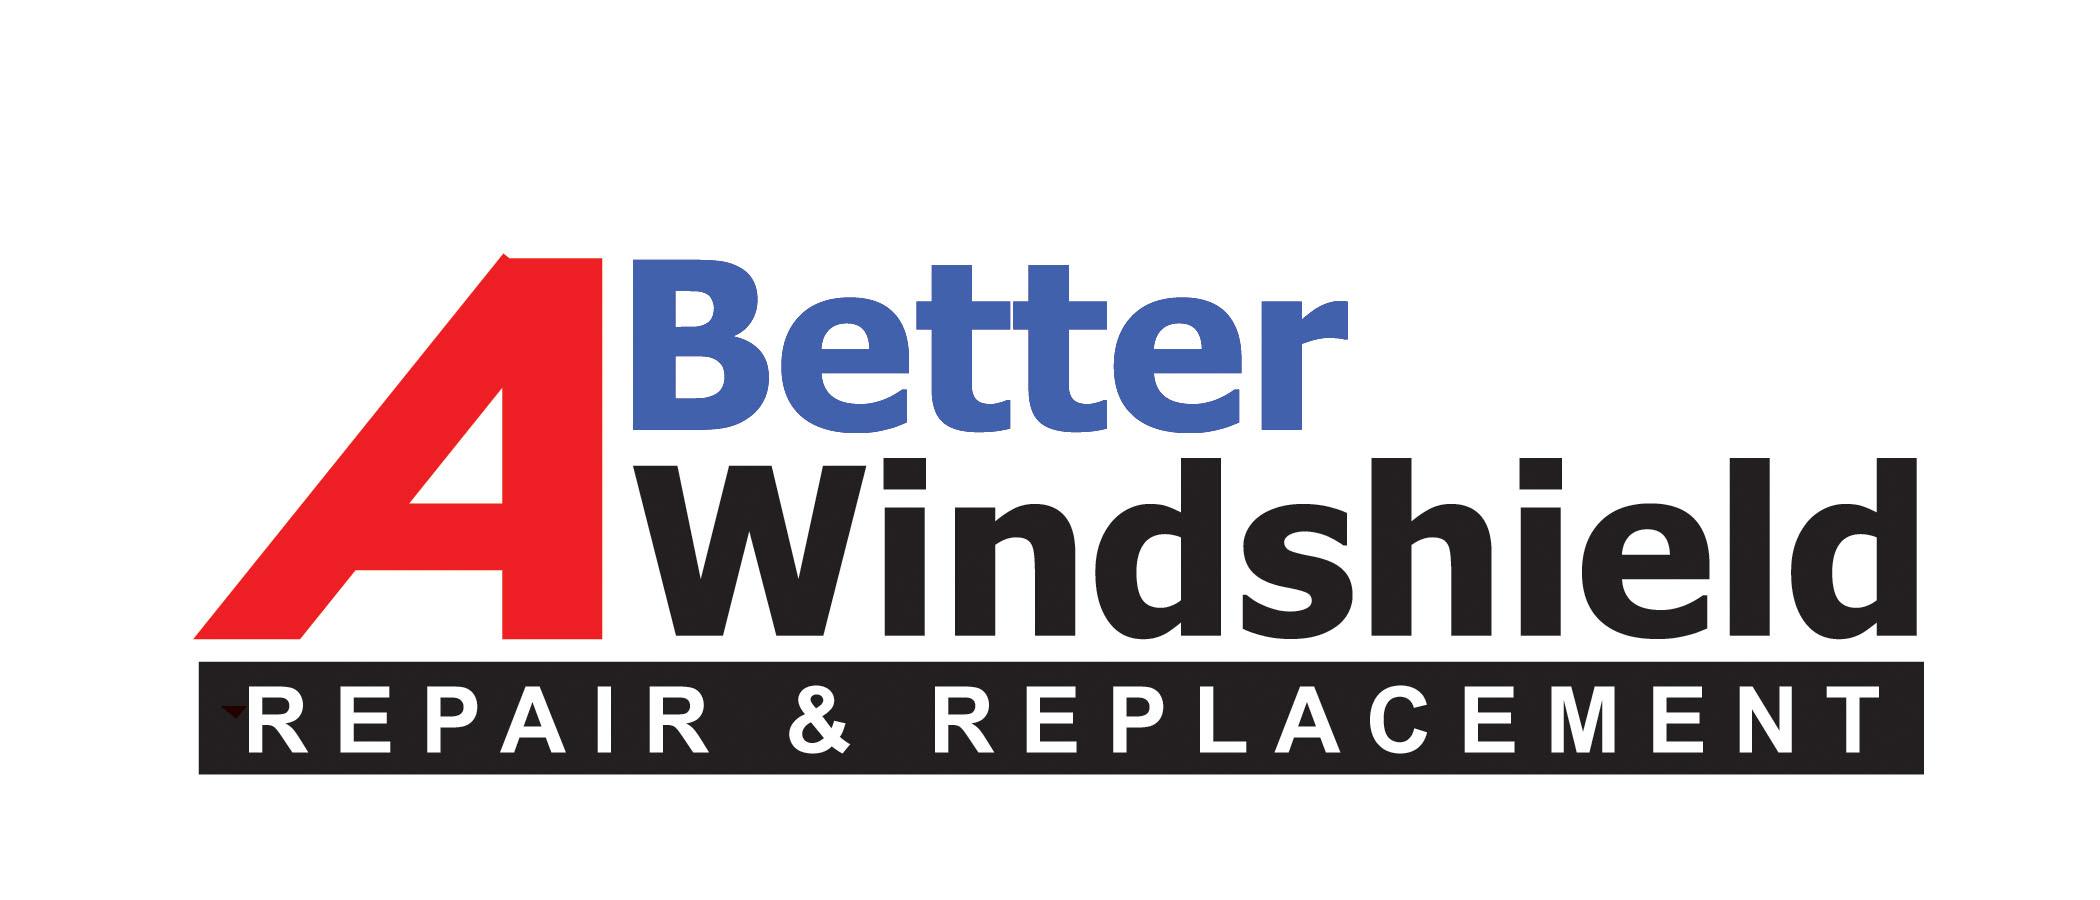 A Better Windshield